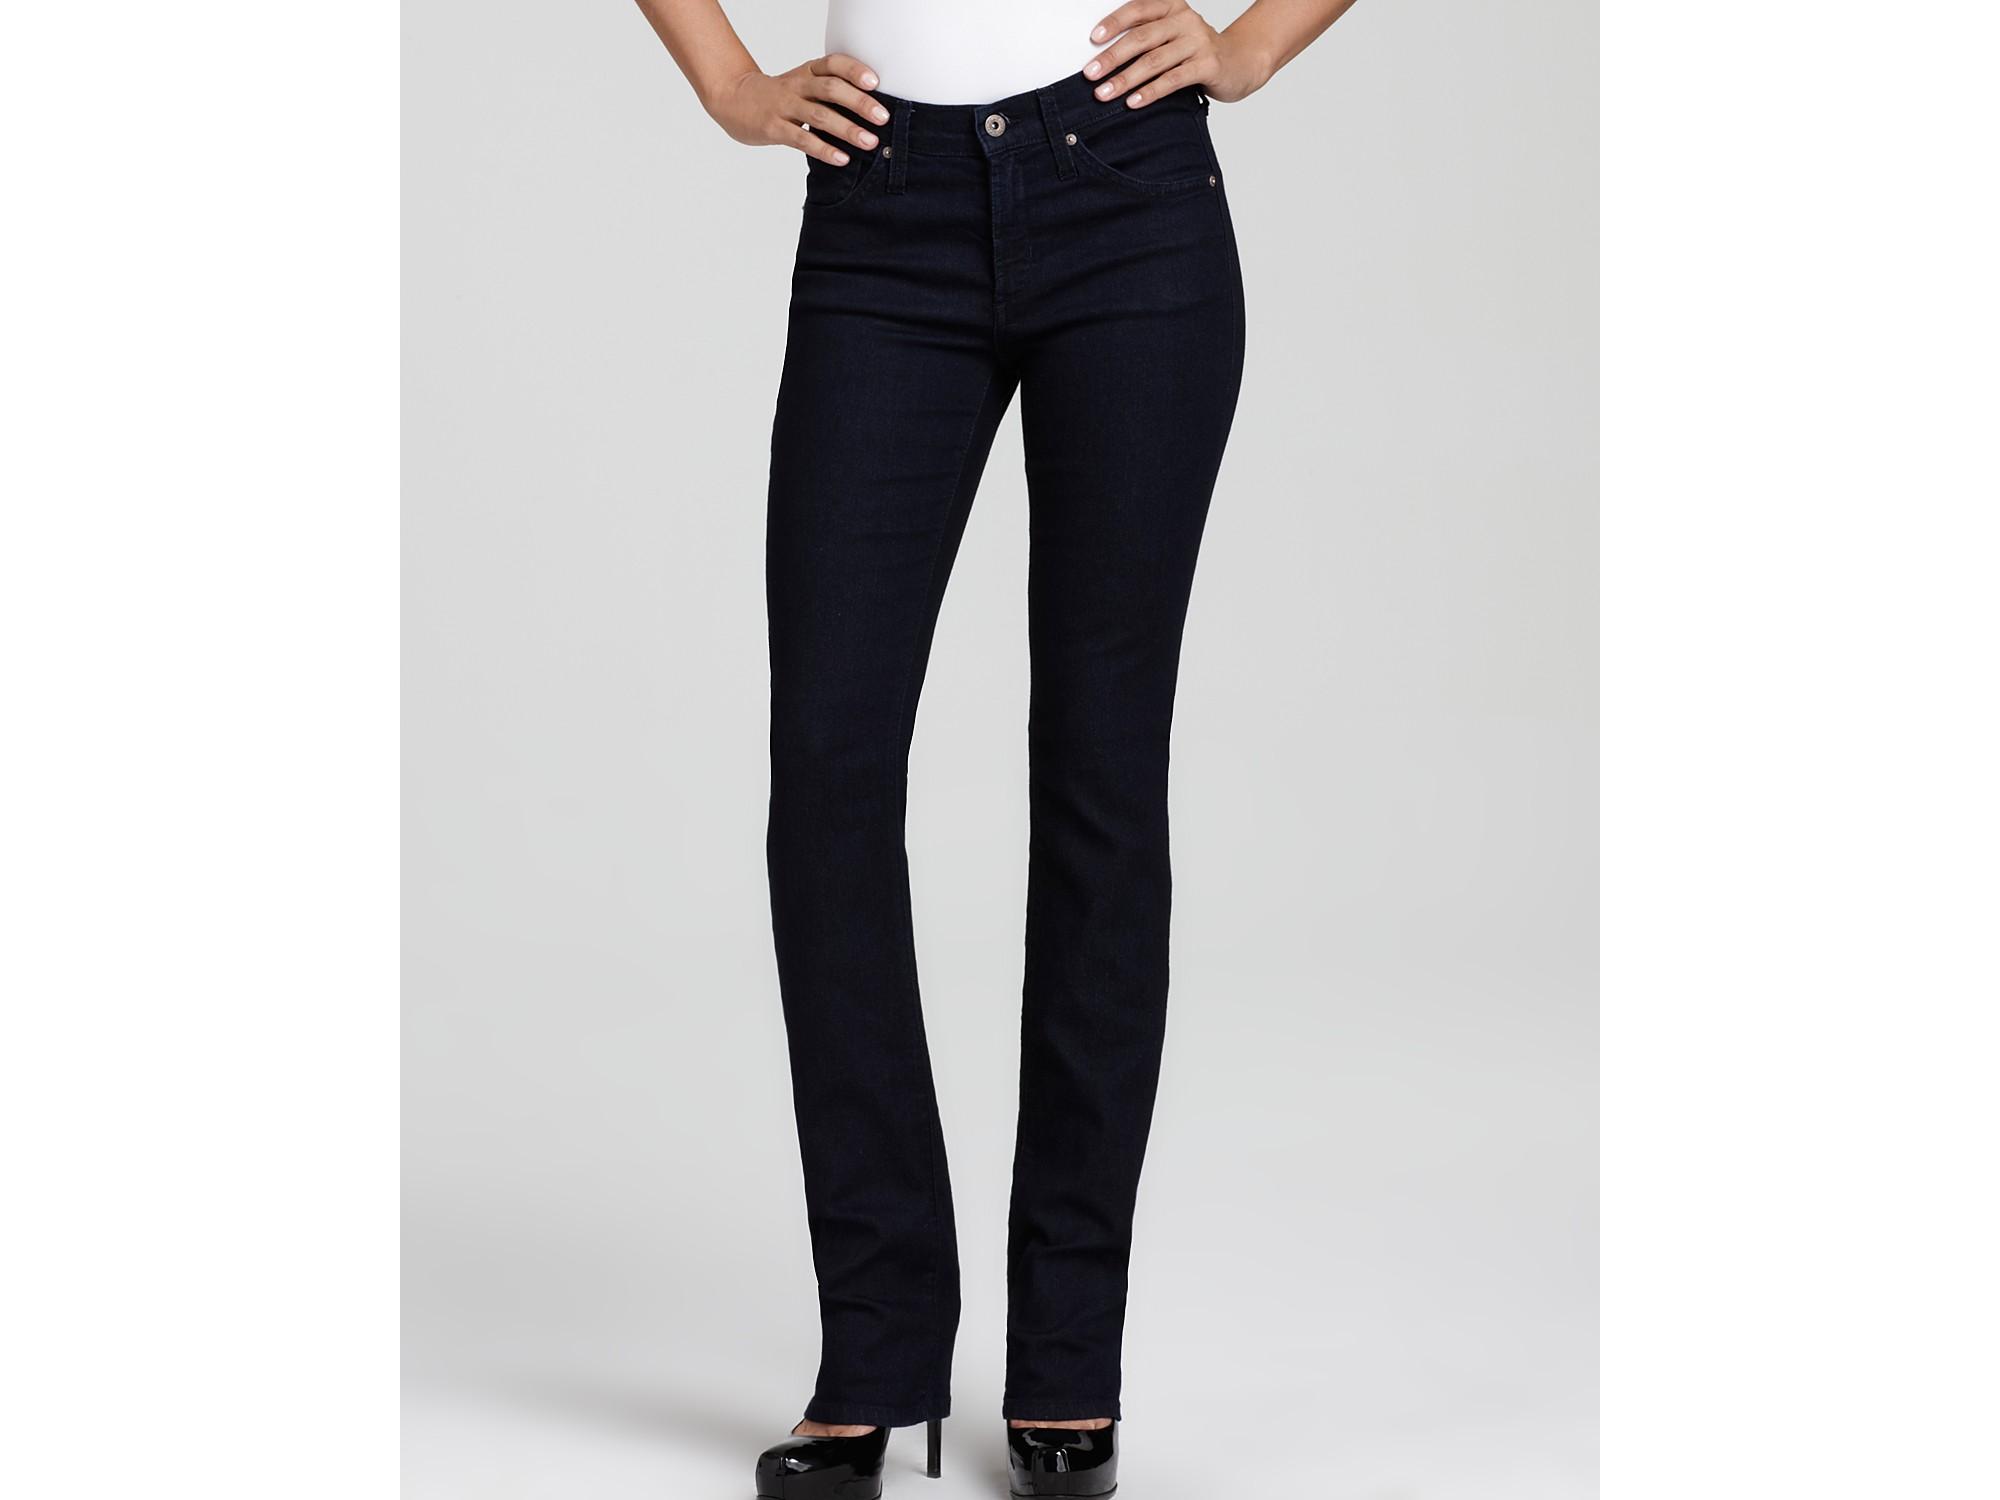 Womens Hunter Straight Jeans James Jeans 2v6Sn